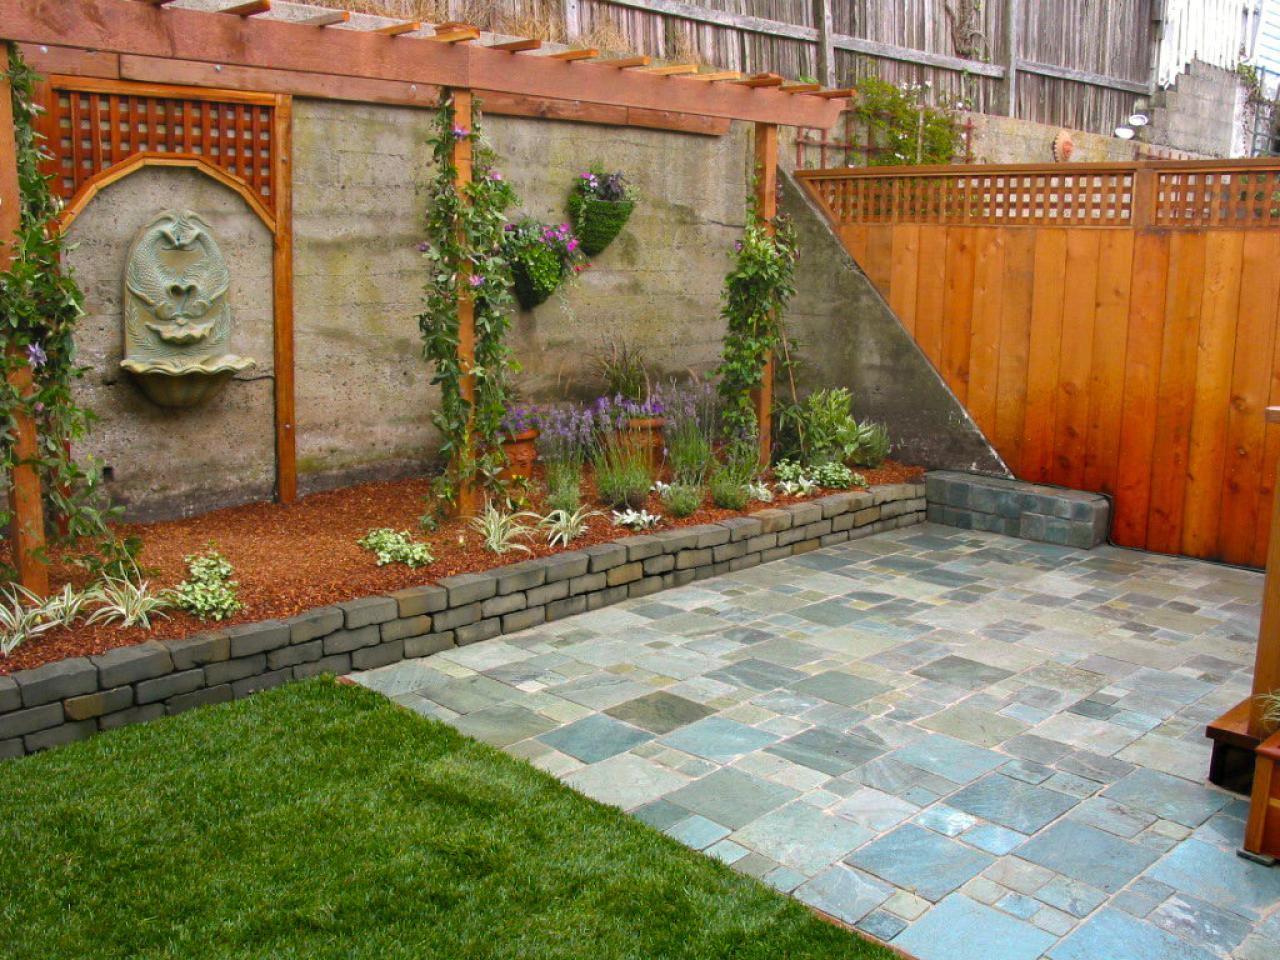 Backyard Fencing Ideas - HomesFeed on Cool Backyard Decorations id=95164